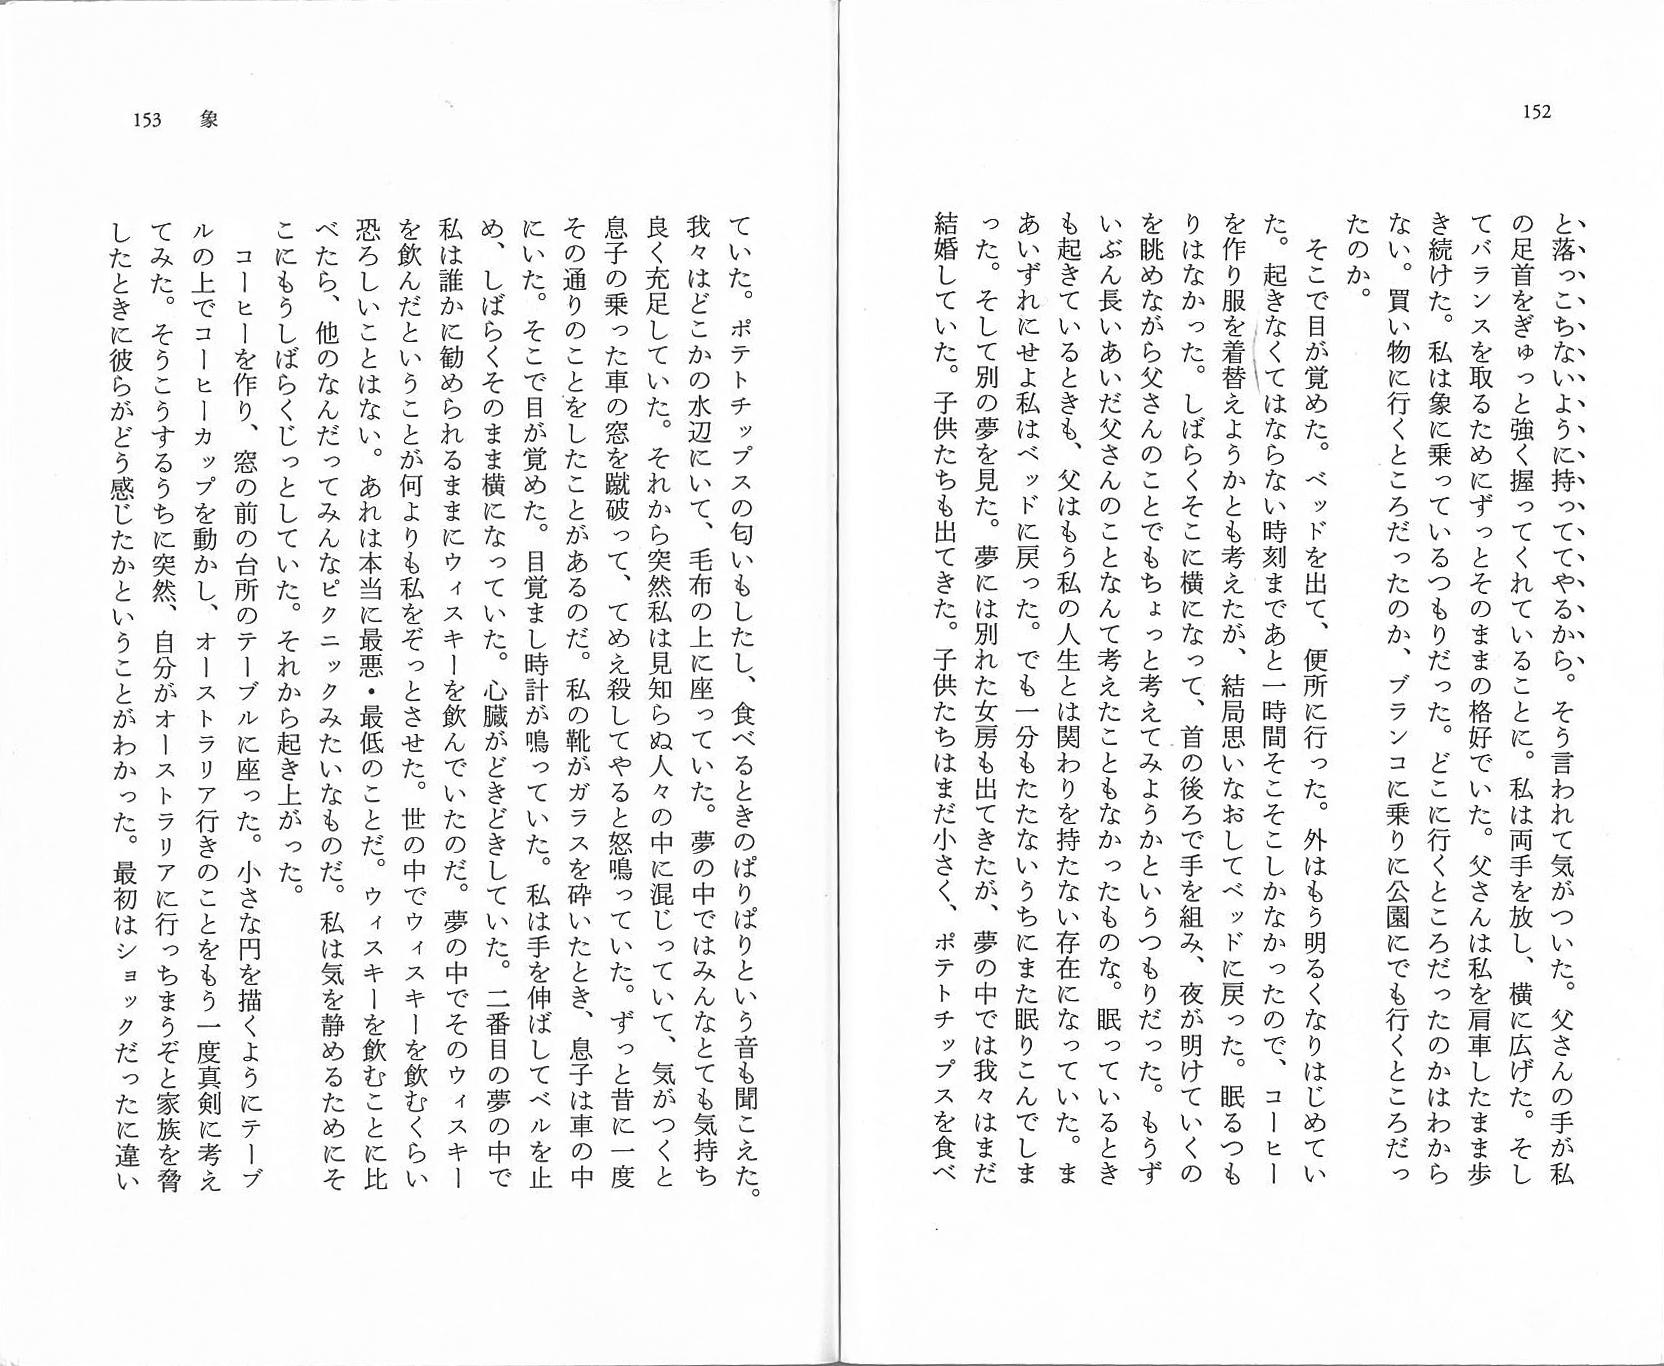 https://cs-sapporo.com/upload/image/7L_honbun_zo.jpg